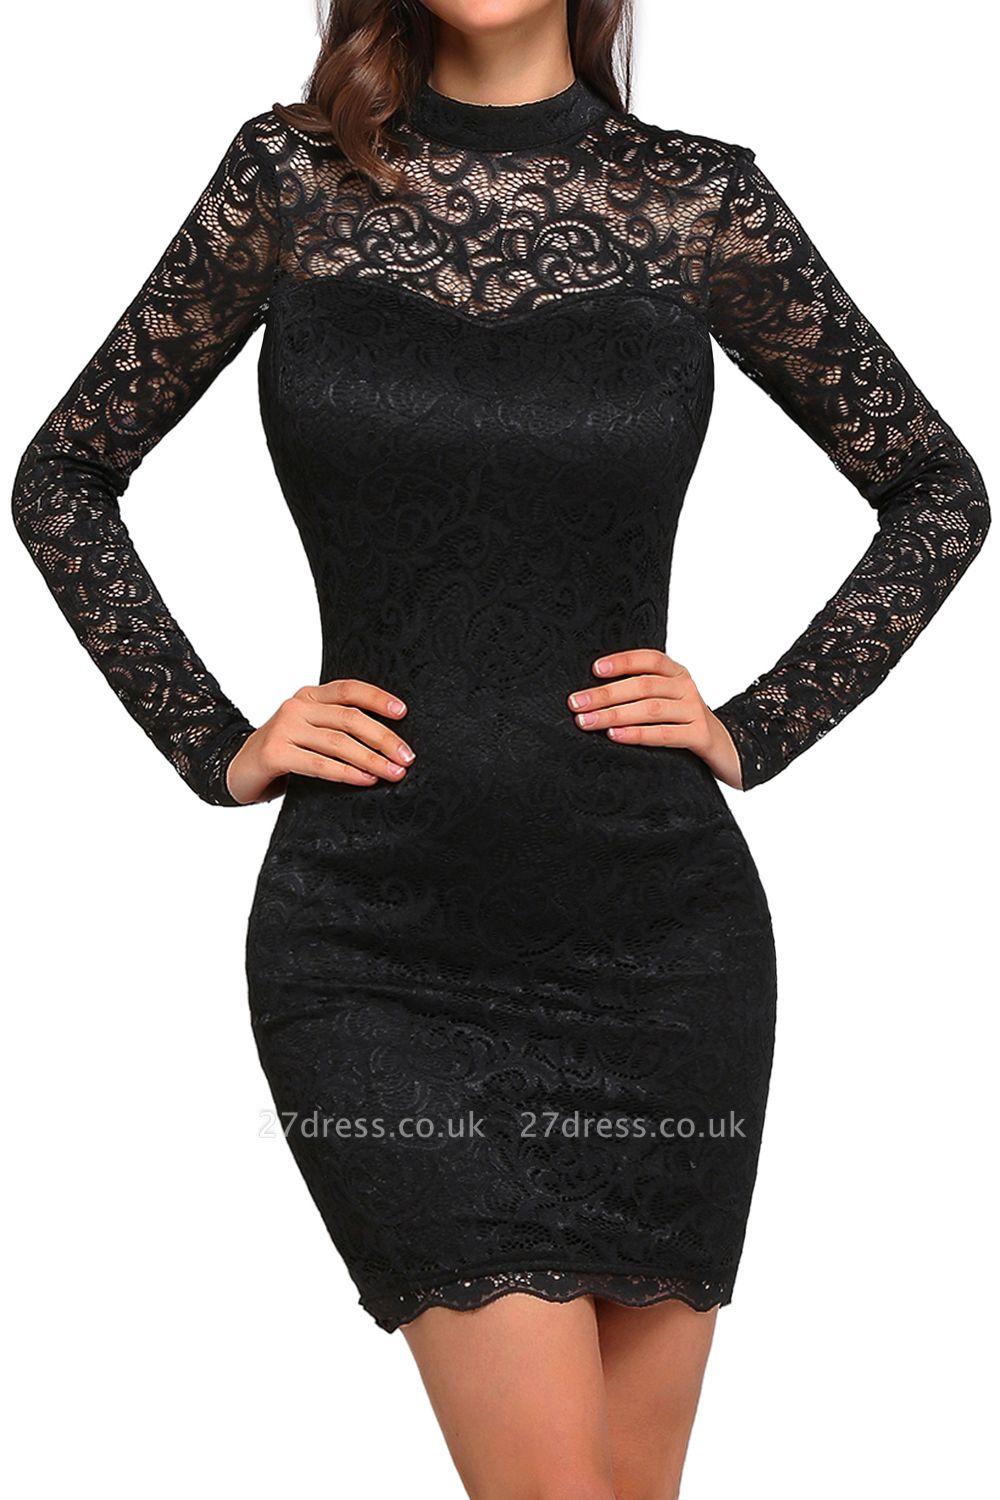 Short Black Long-Sleeves Lace High-Neck Party Dress UK